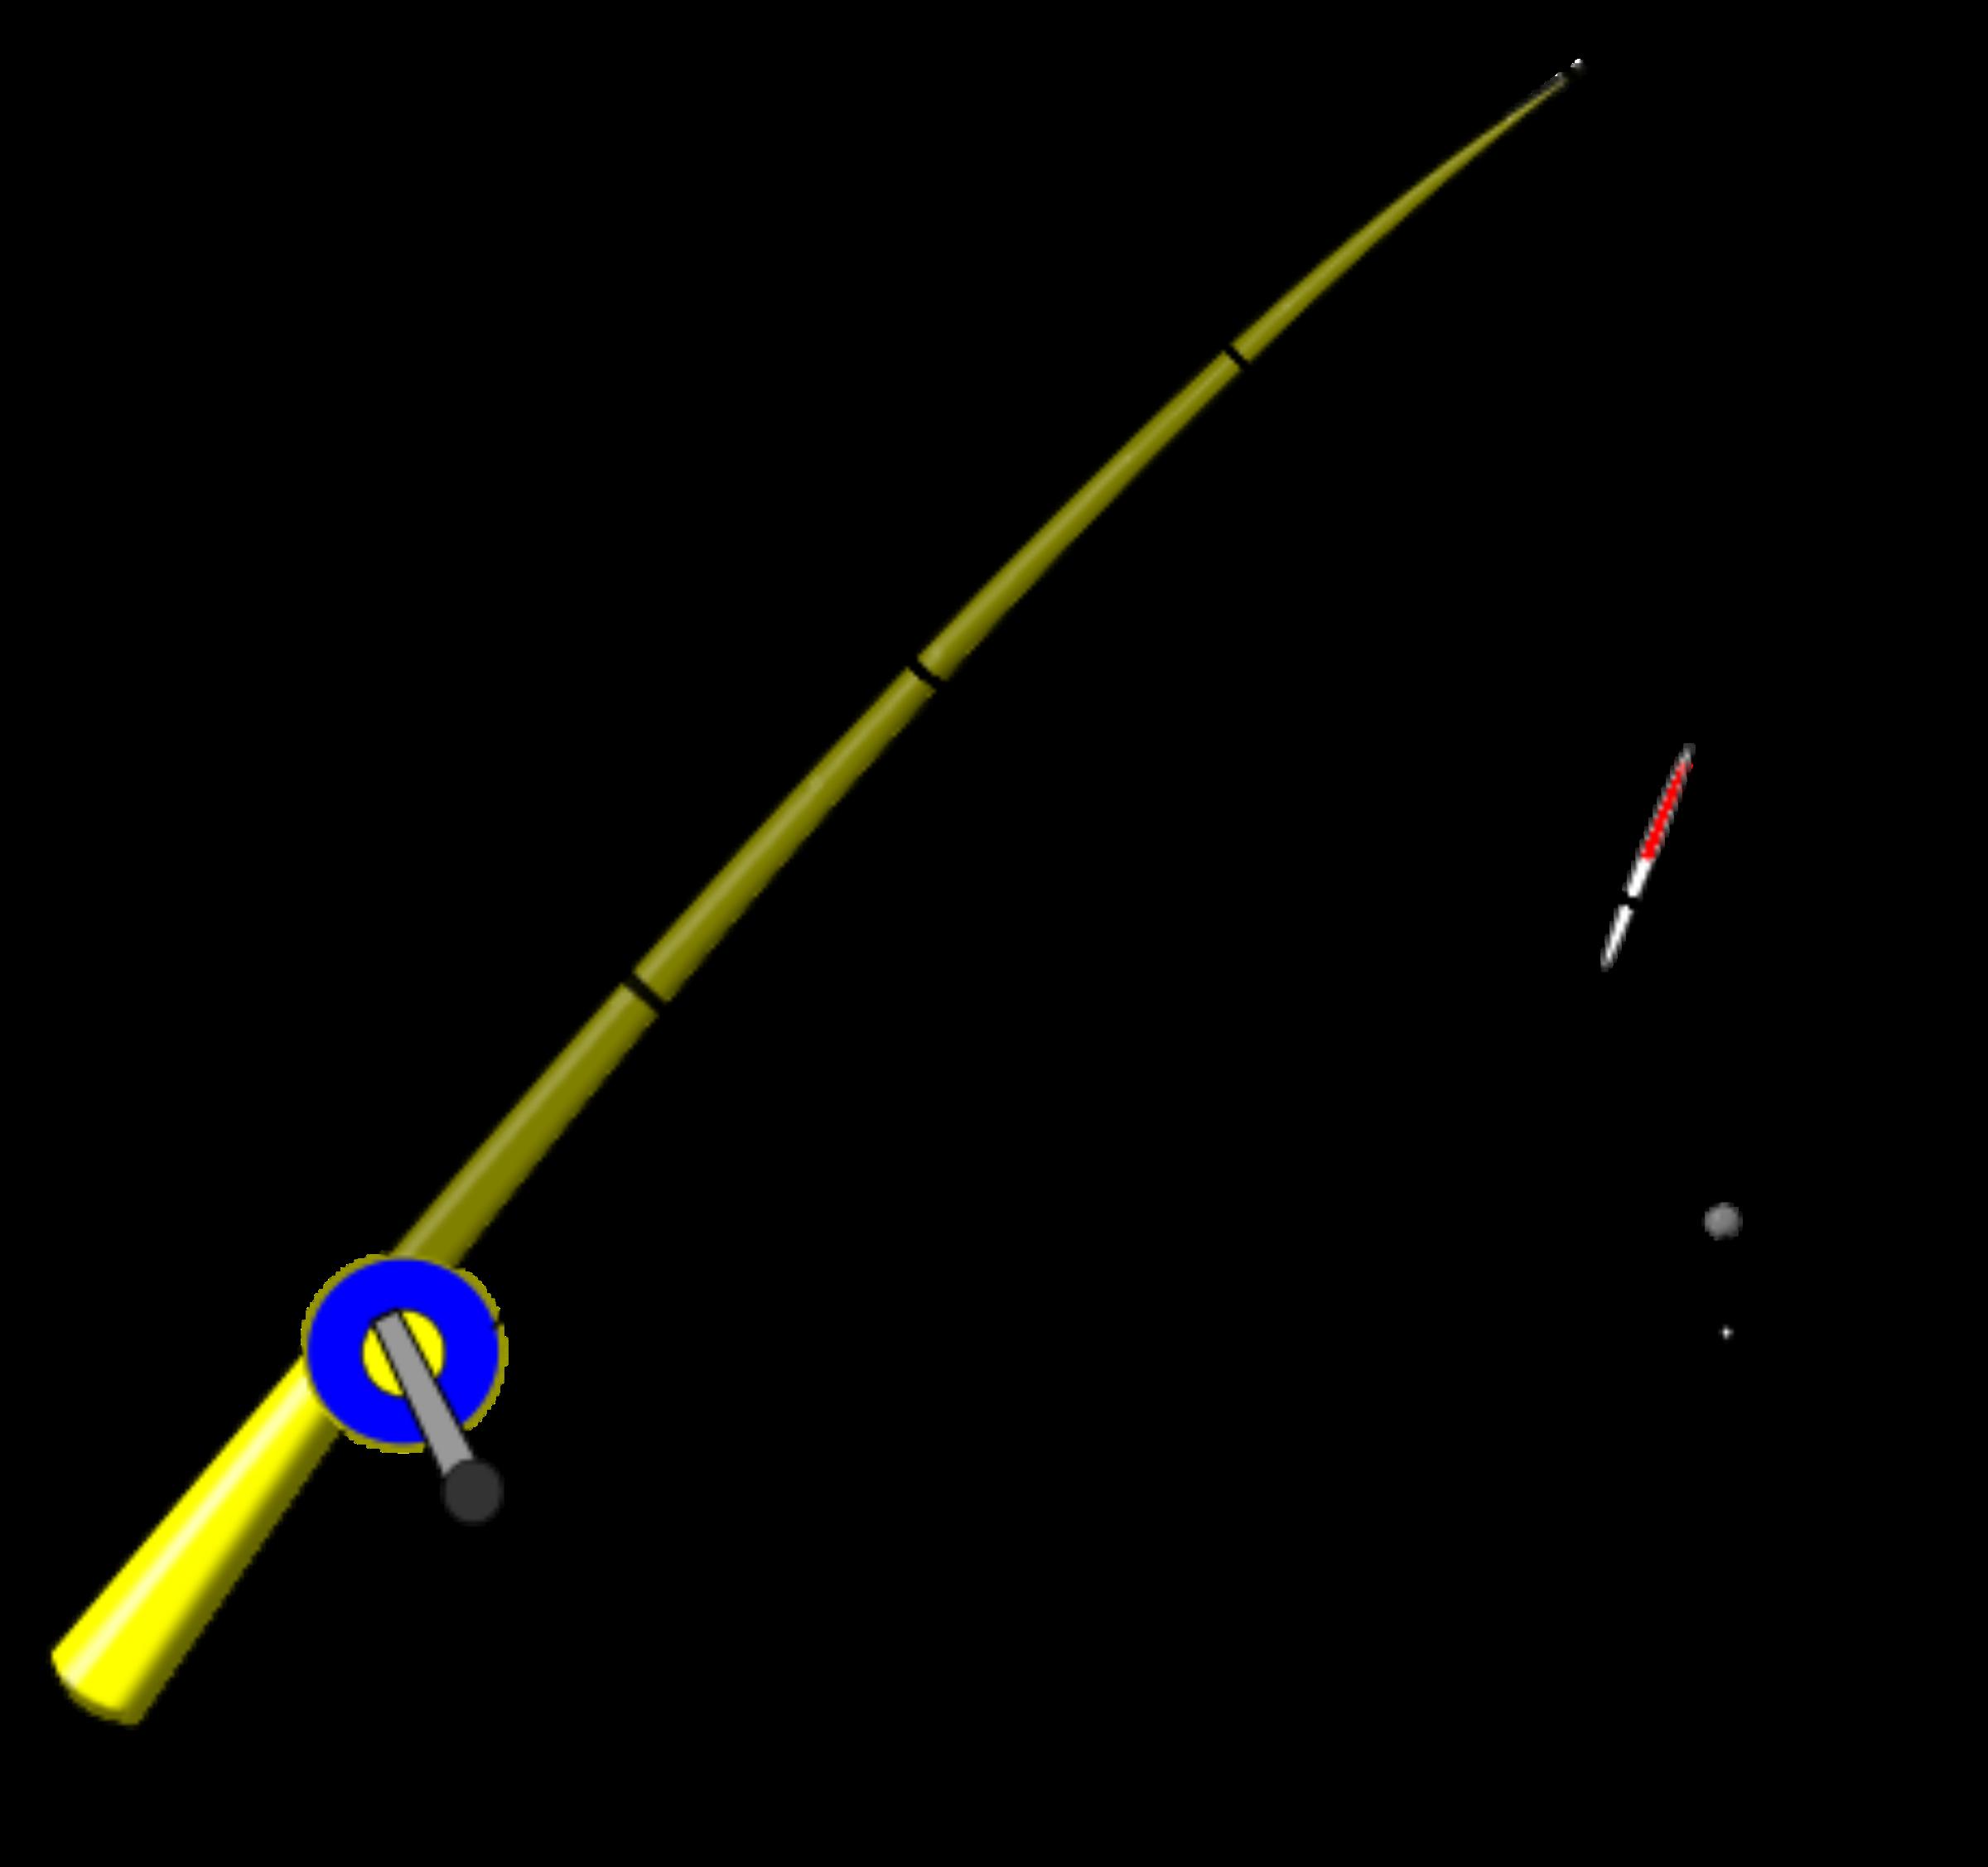 Fishing Pole Clipart Fishing Rod Image 2-Fishing pole clipart fishing rod image 2-5